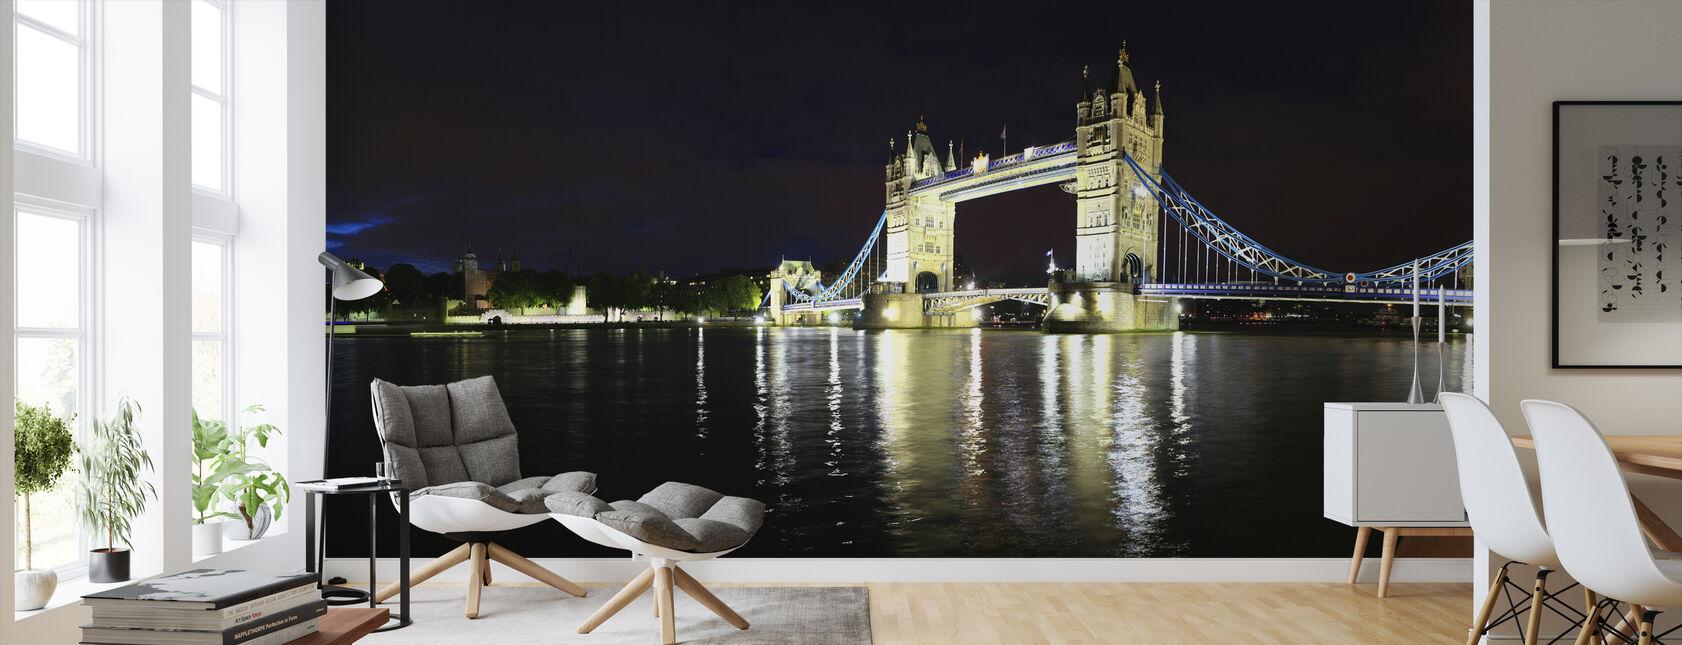 London Tower Bridge at Night - Wallpaper - Living Room